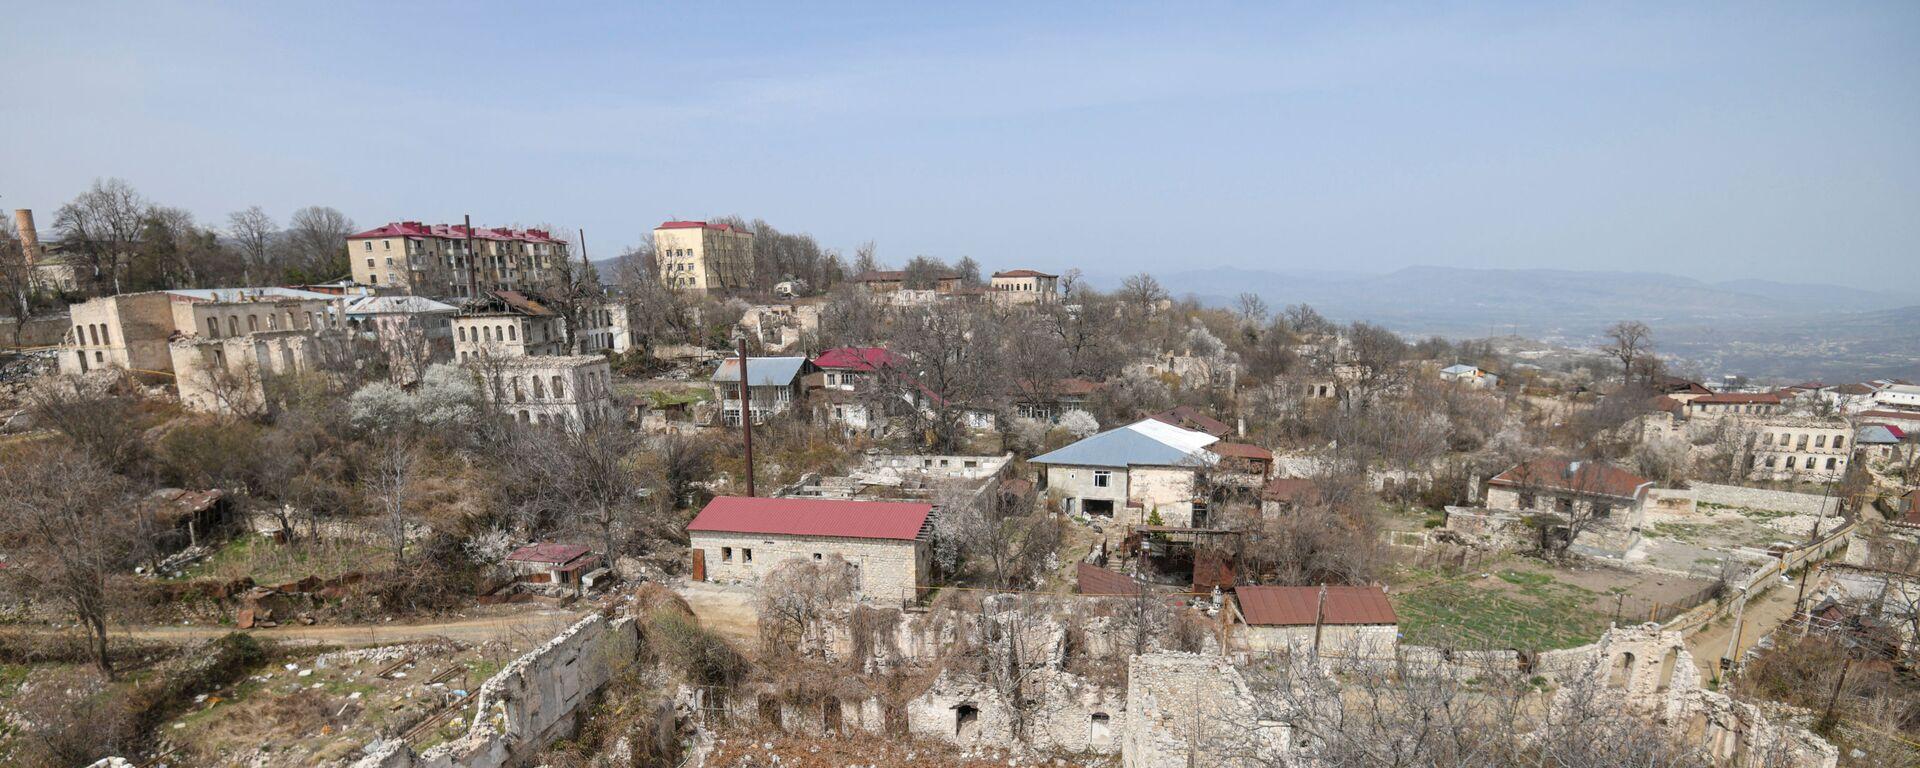 Вид на город Шуша, фото из архива - Sputnik Azərbaycan, 1920, 18.09.2021